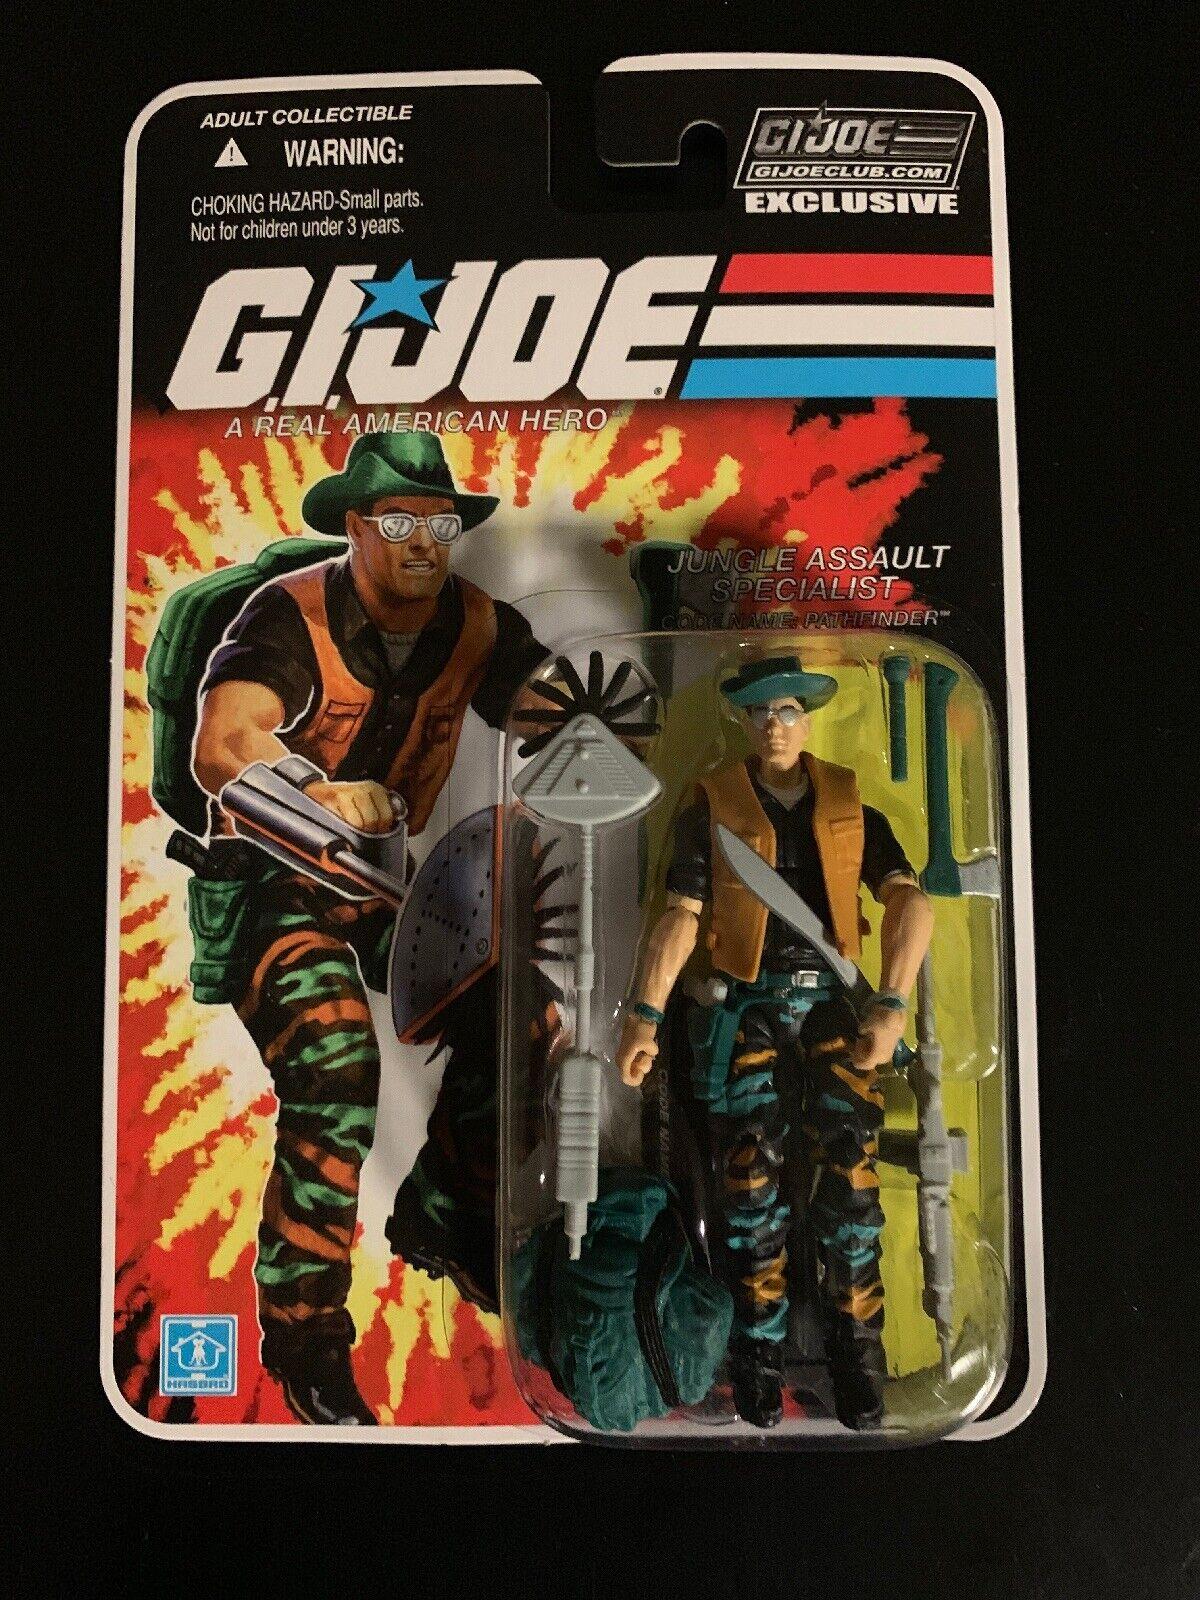 GI JOE FSS 4.0 05 Pathfinder Gijoe Jungle Assault specialeeeist MISP